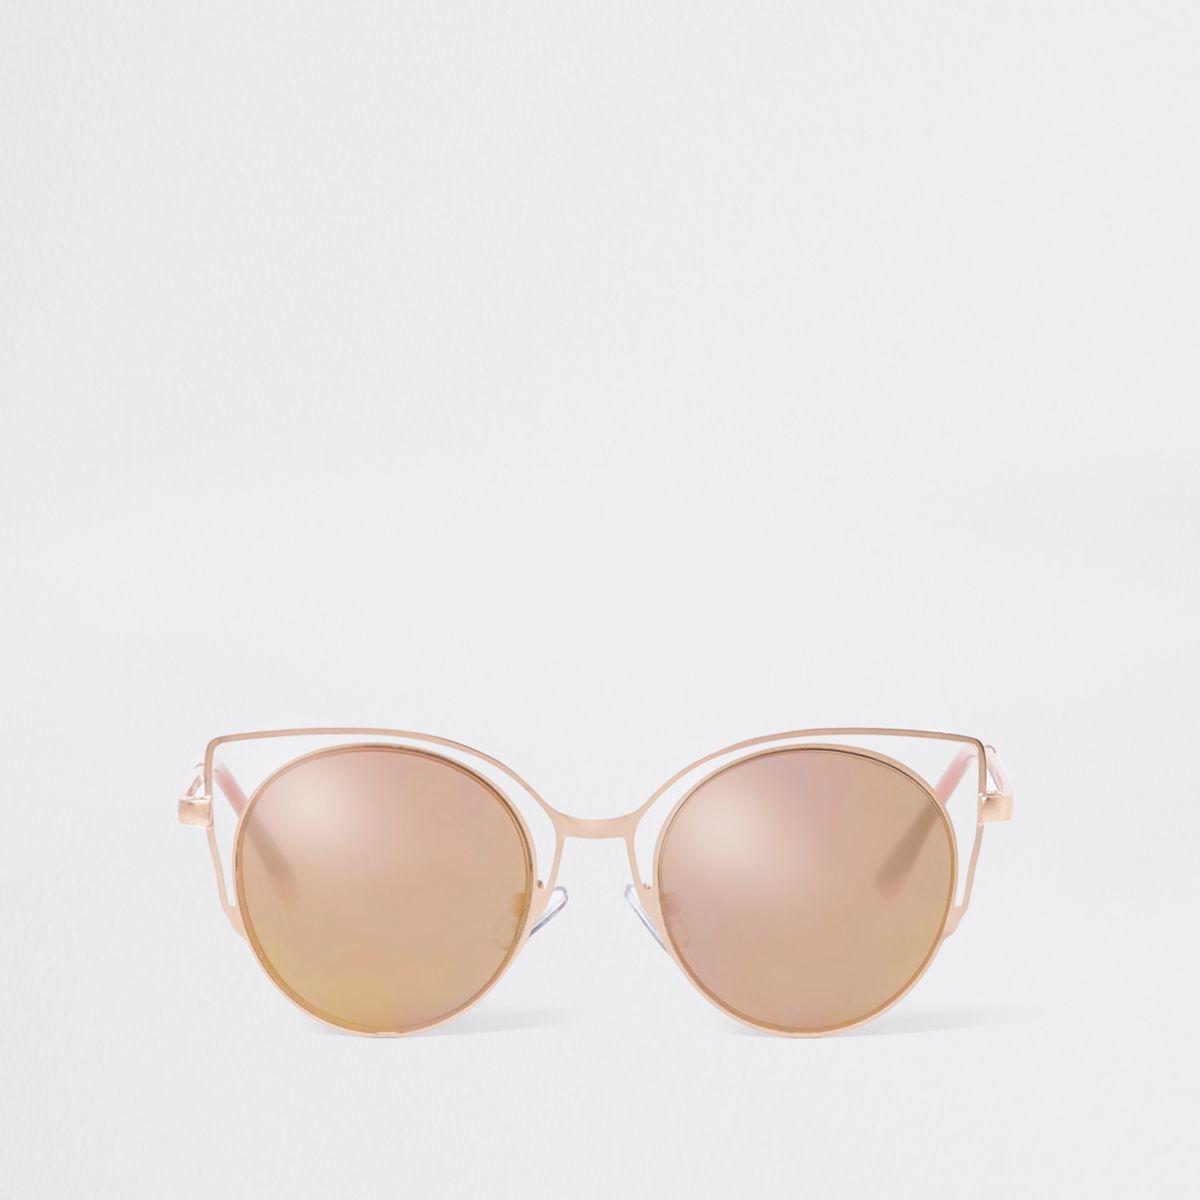 Girls rose gold tone cat eye sunglasses